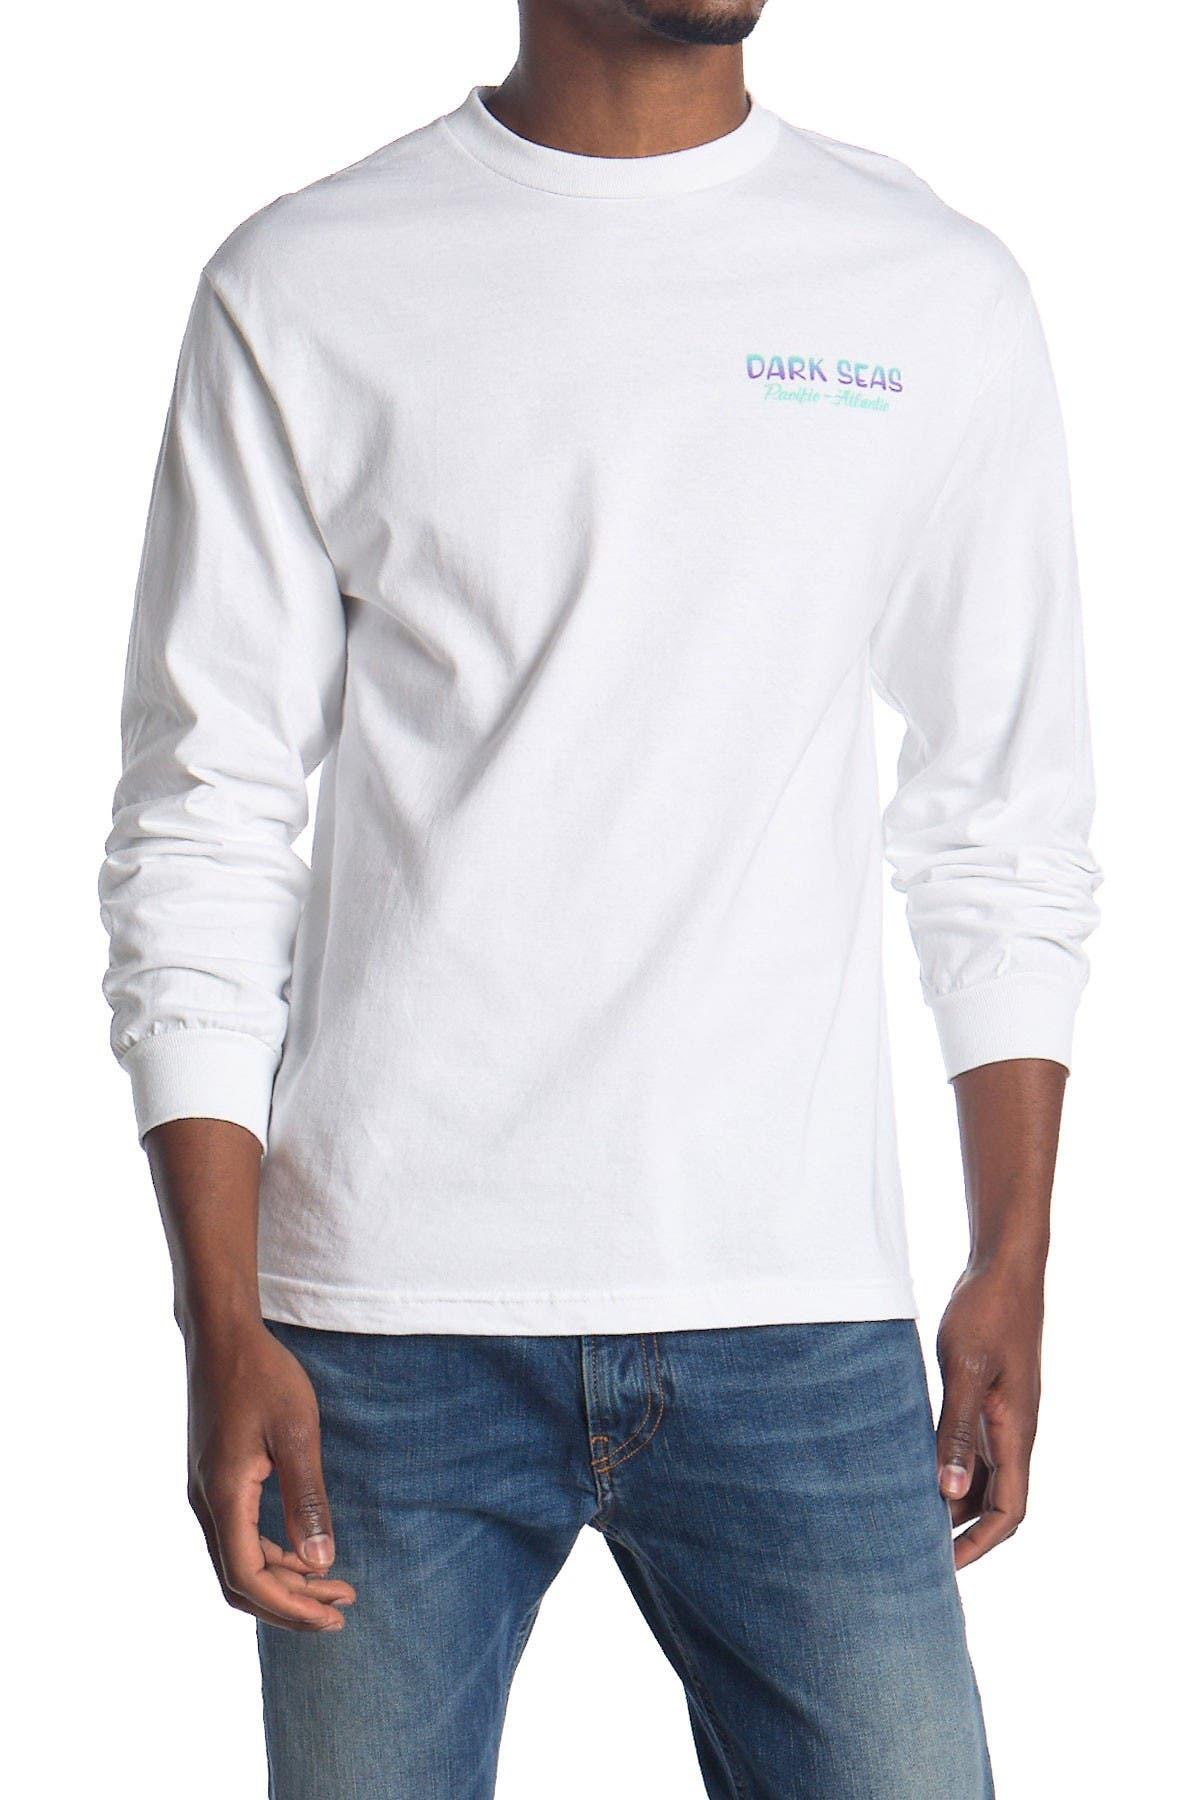 Image of DARK SEAS Avalon Long Sleeve Graphic Shirt